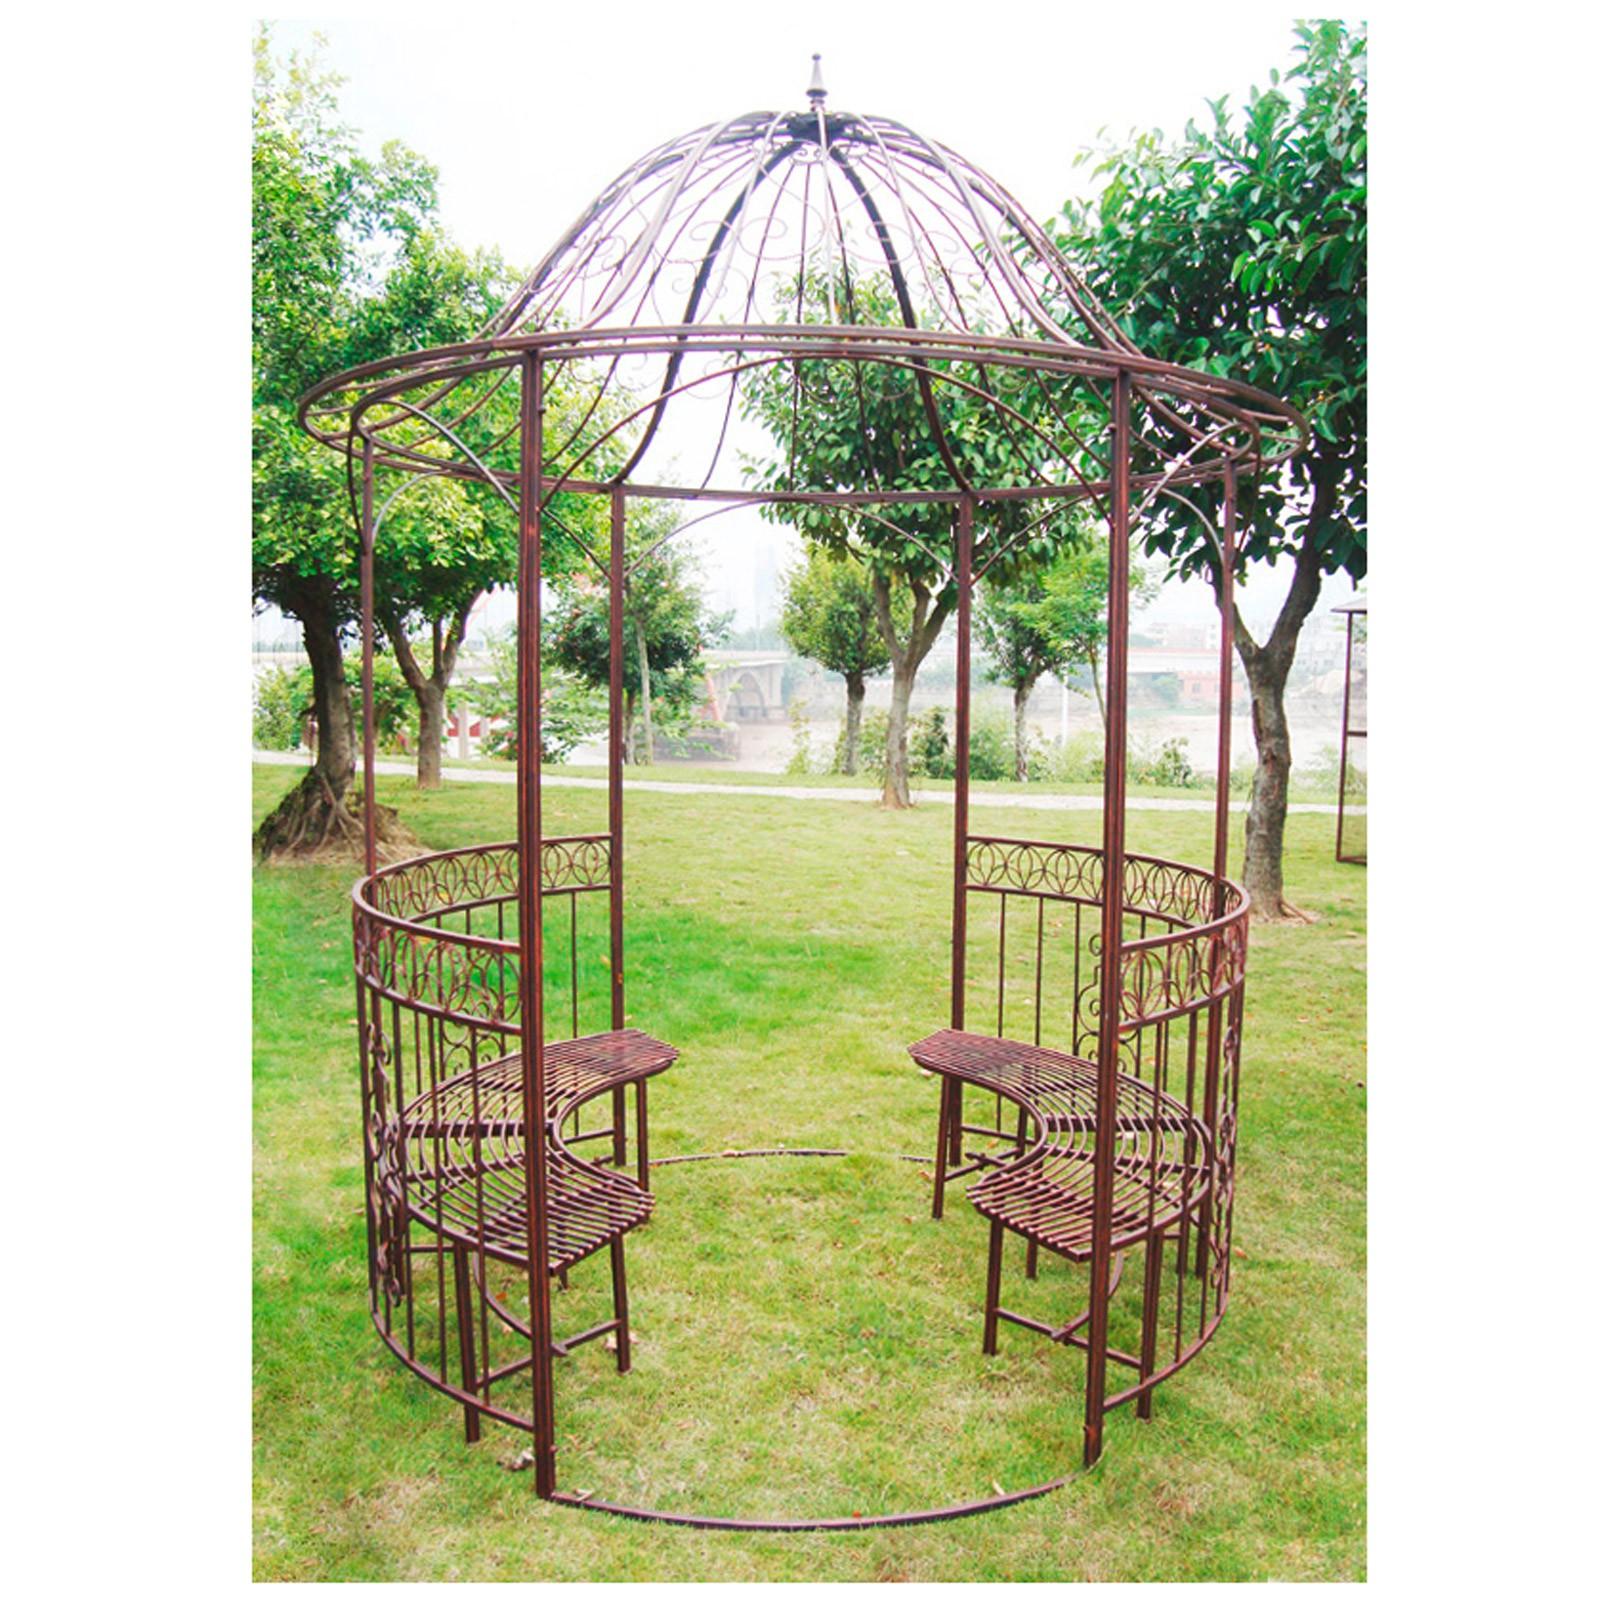 garten pavillon metallpavillon sun antik kupfer look. Black Bedroom Furniture Sets. Home Design Ideas